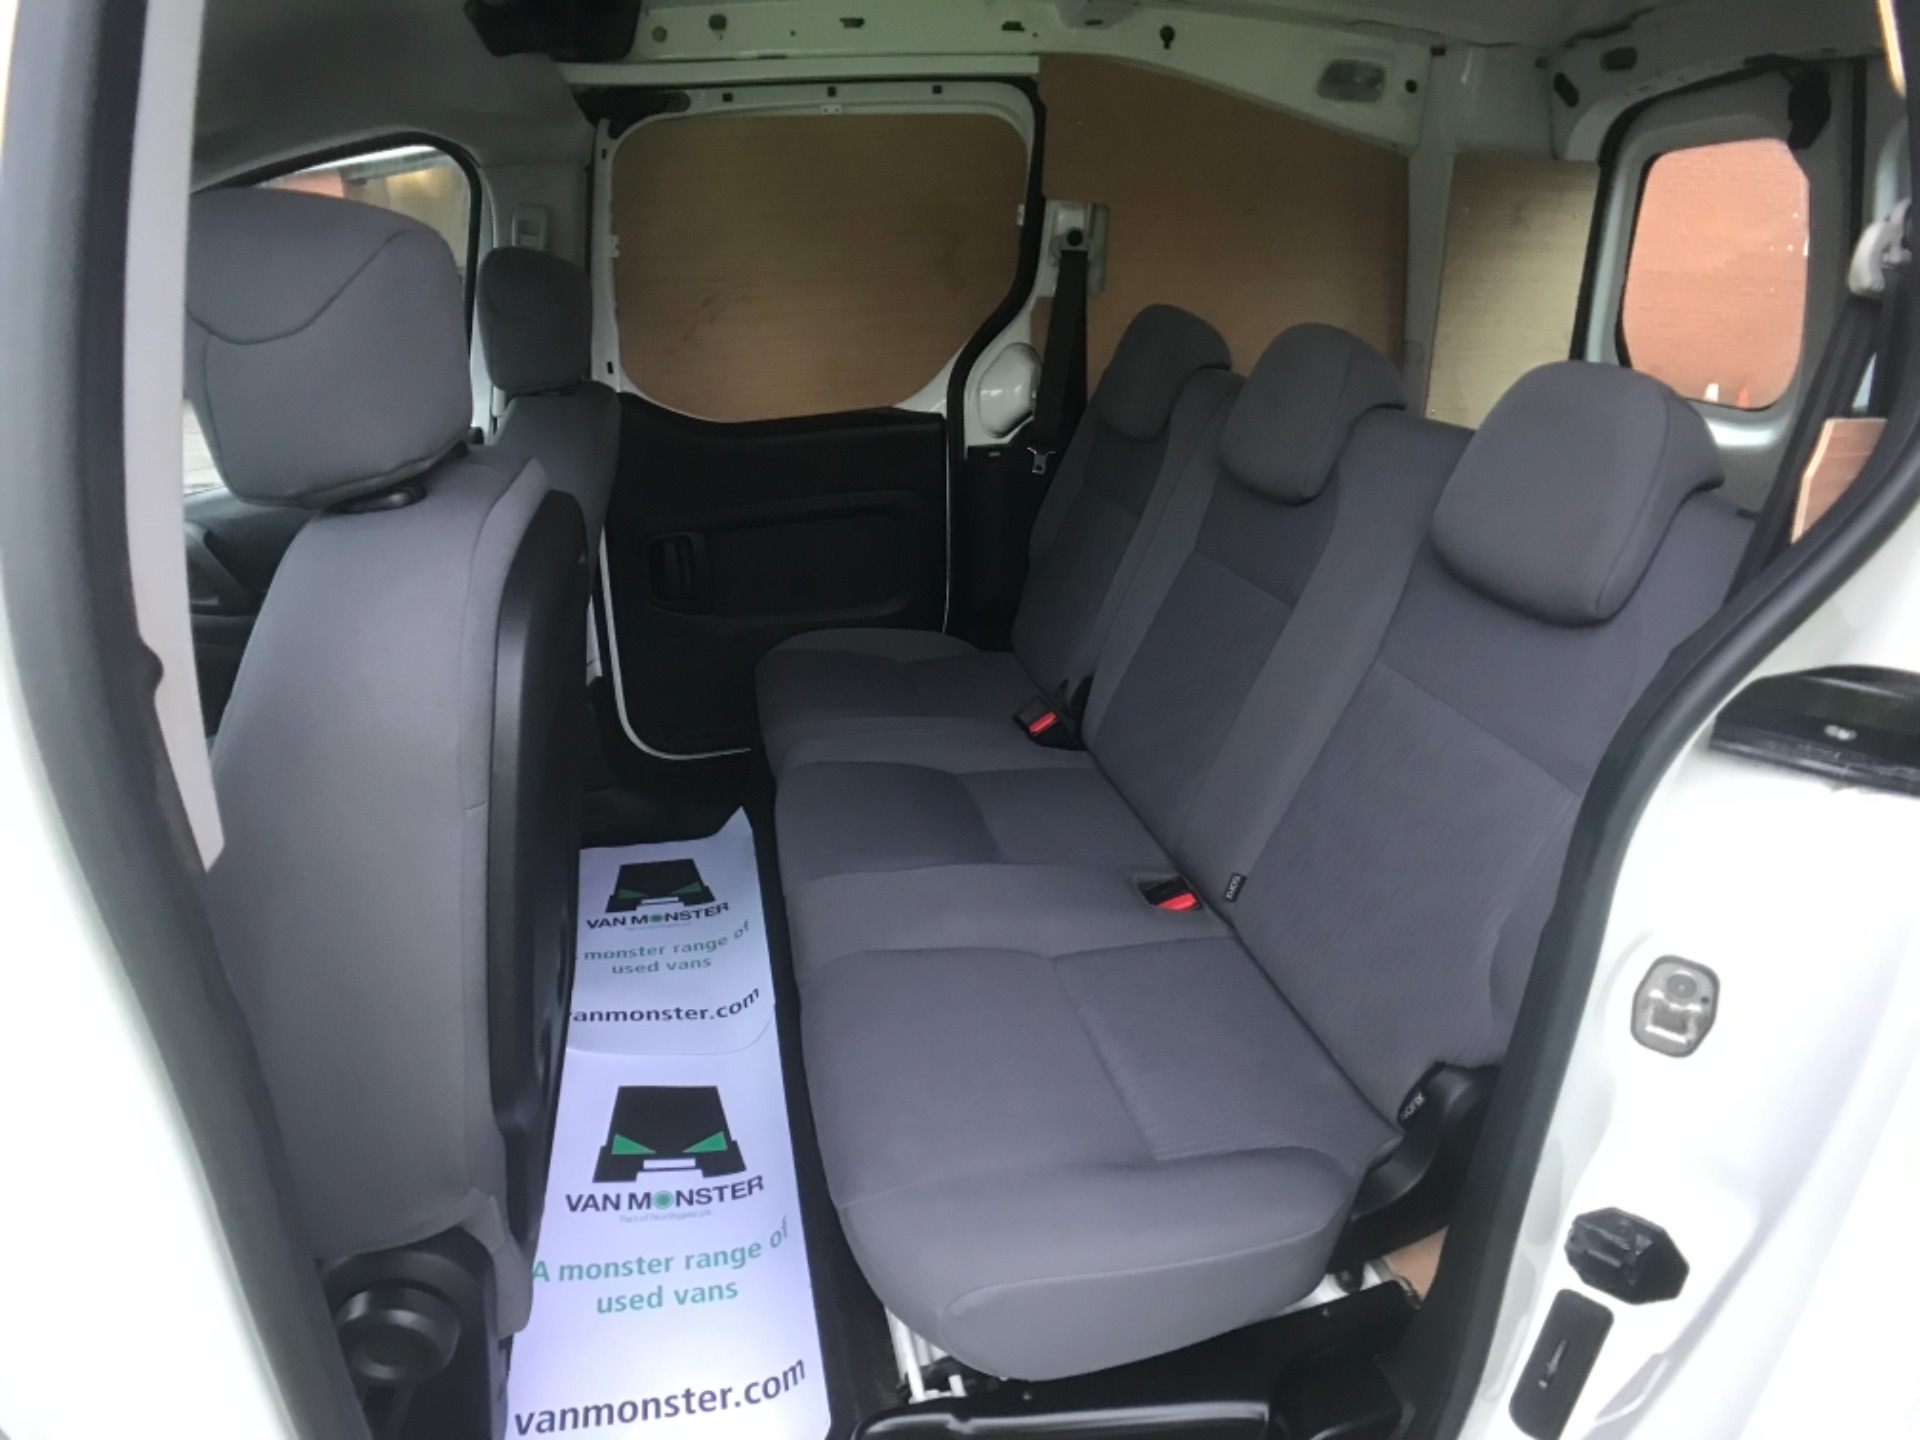 2016 Peugeot Partner 715 S 1.6 Hdi 92 Crew Van Euro 5 (NU16XWM) Image 13